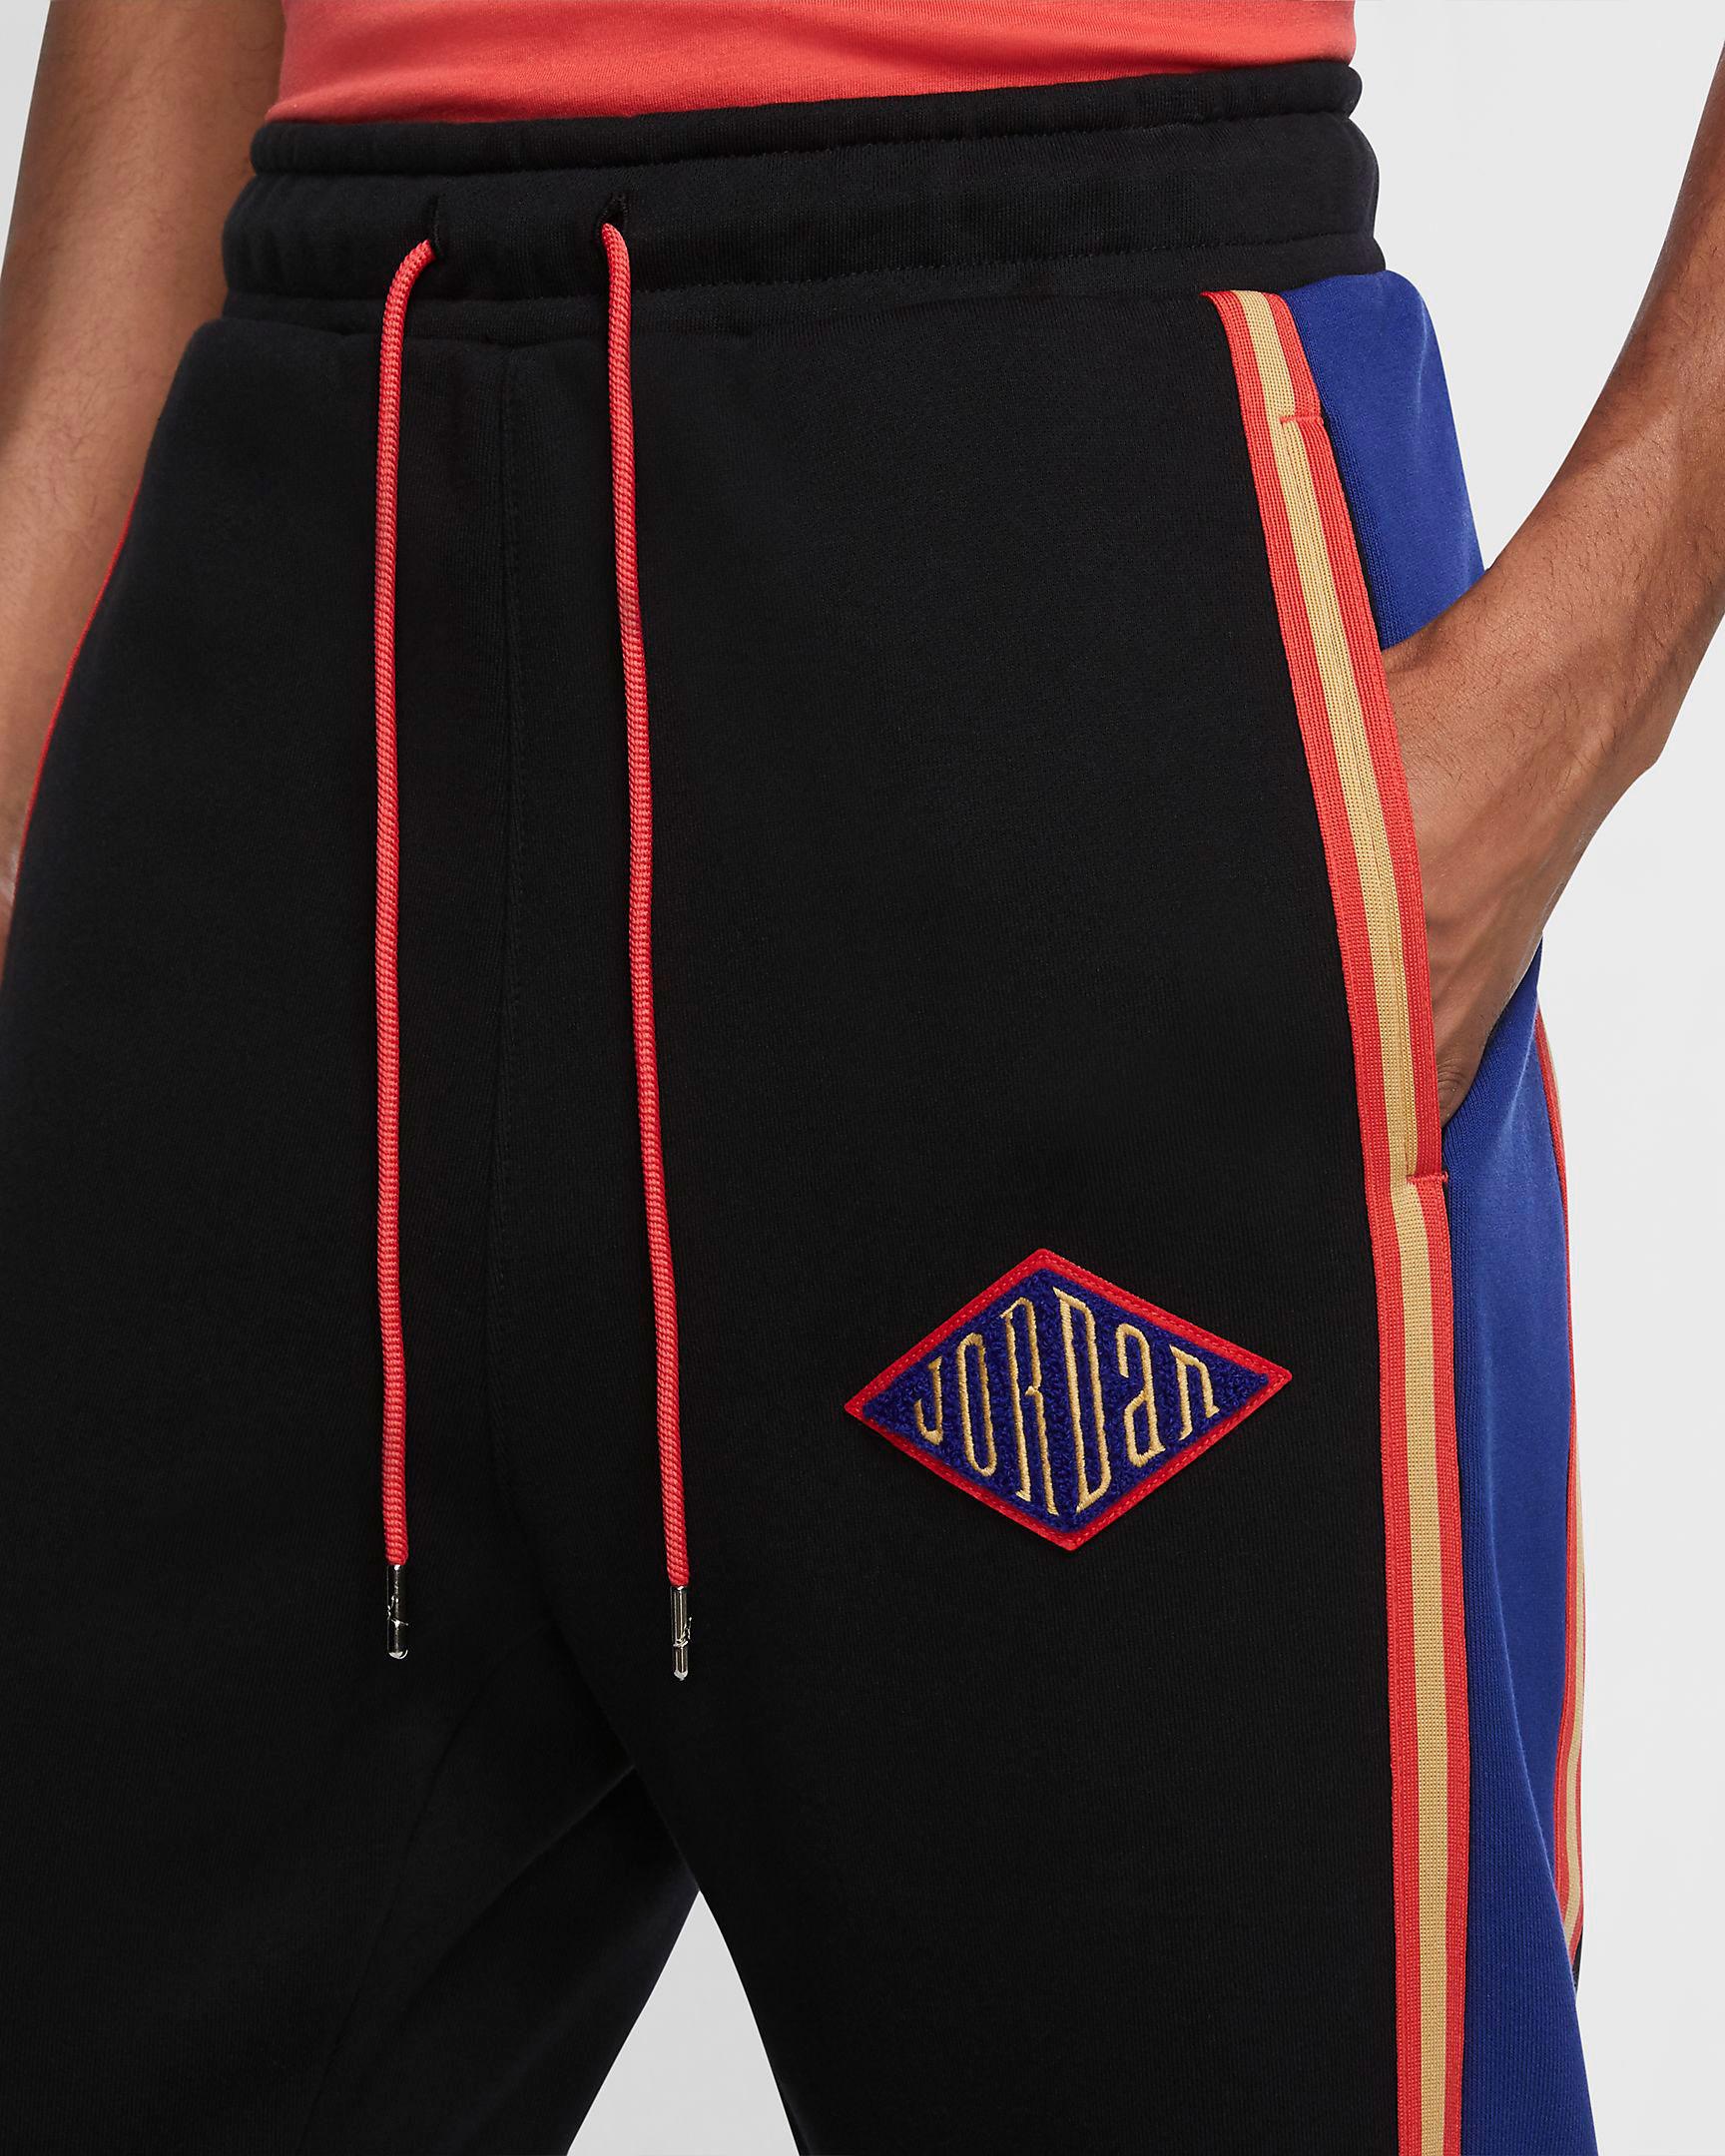 jordan-sport-dna-pants-black-royal-3